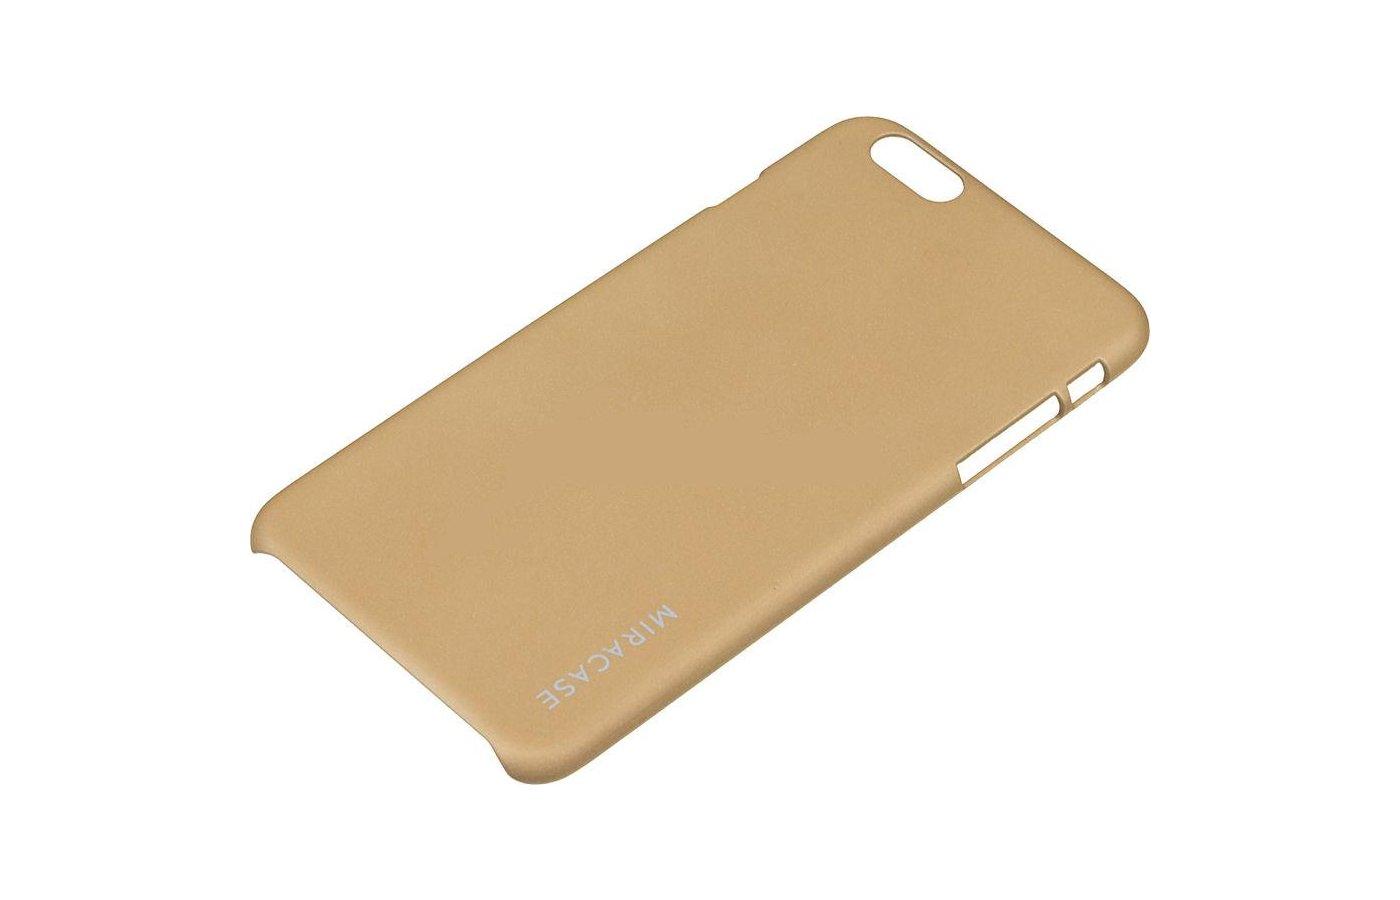 Чехол Miracase для iPhone 6/6S Plus MS-8403 quicksand золотистый